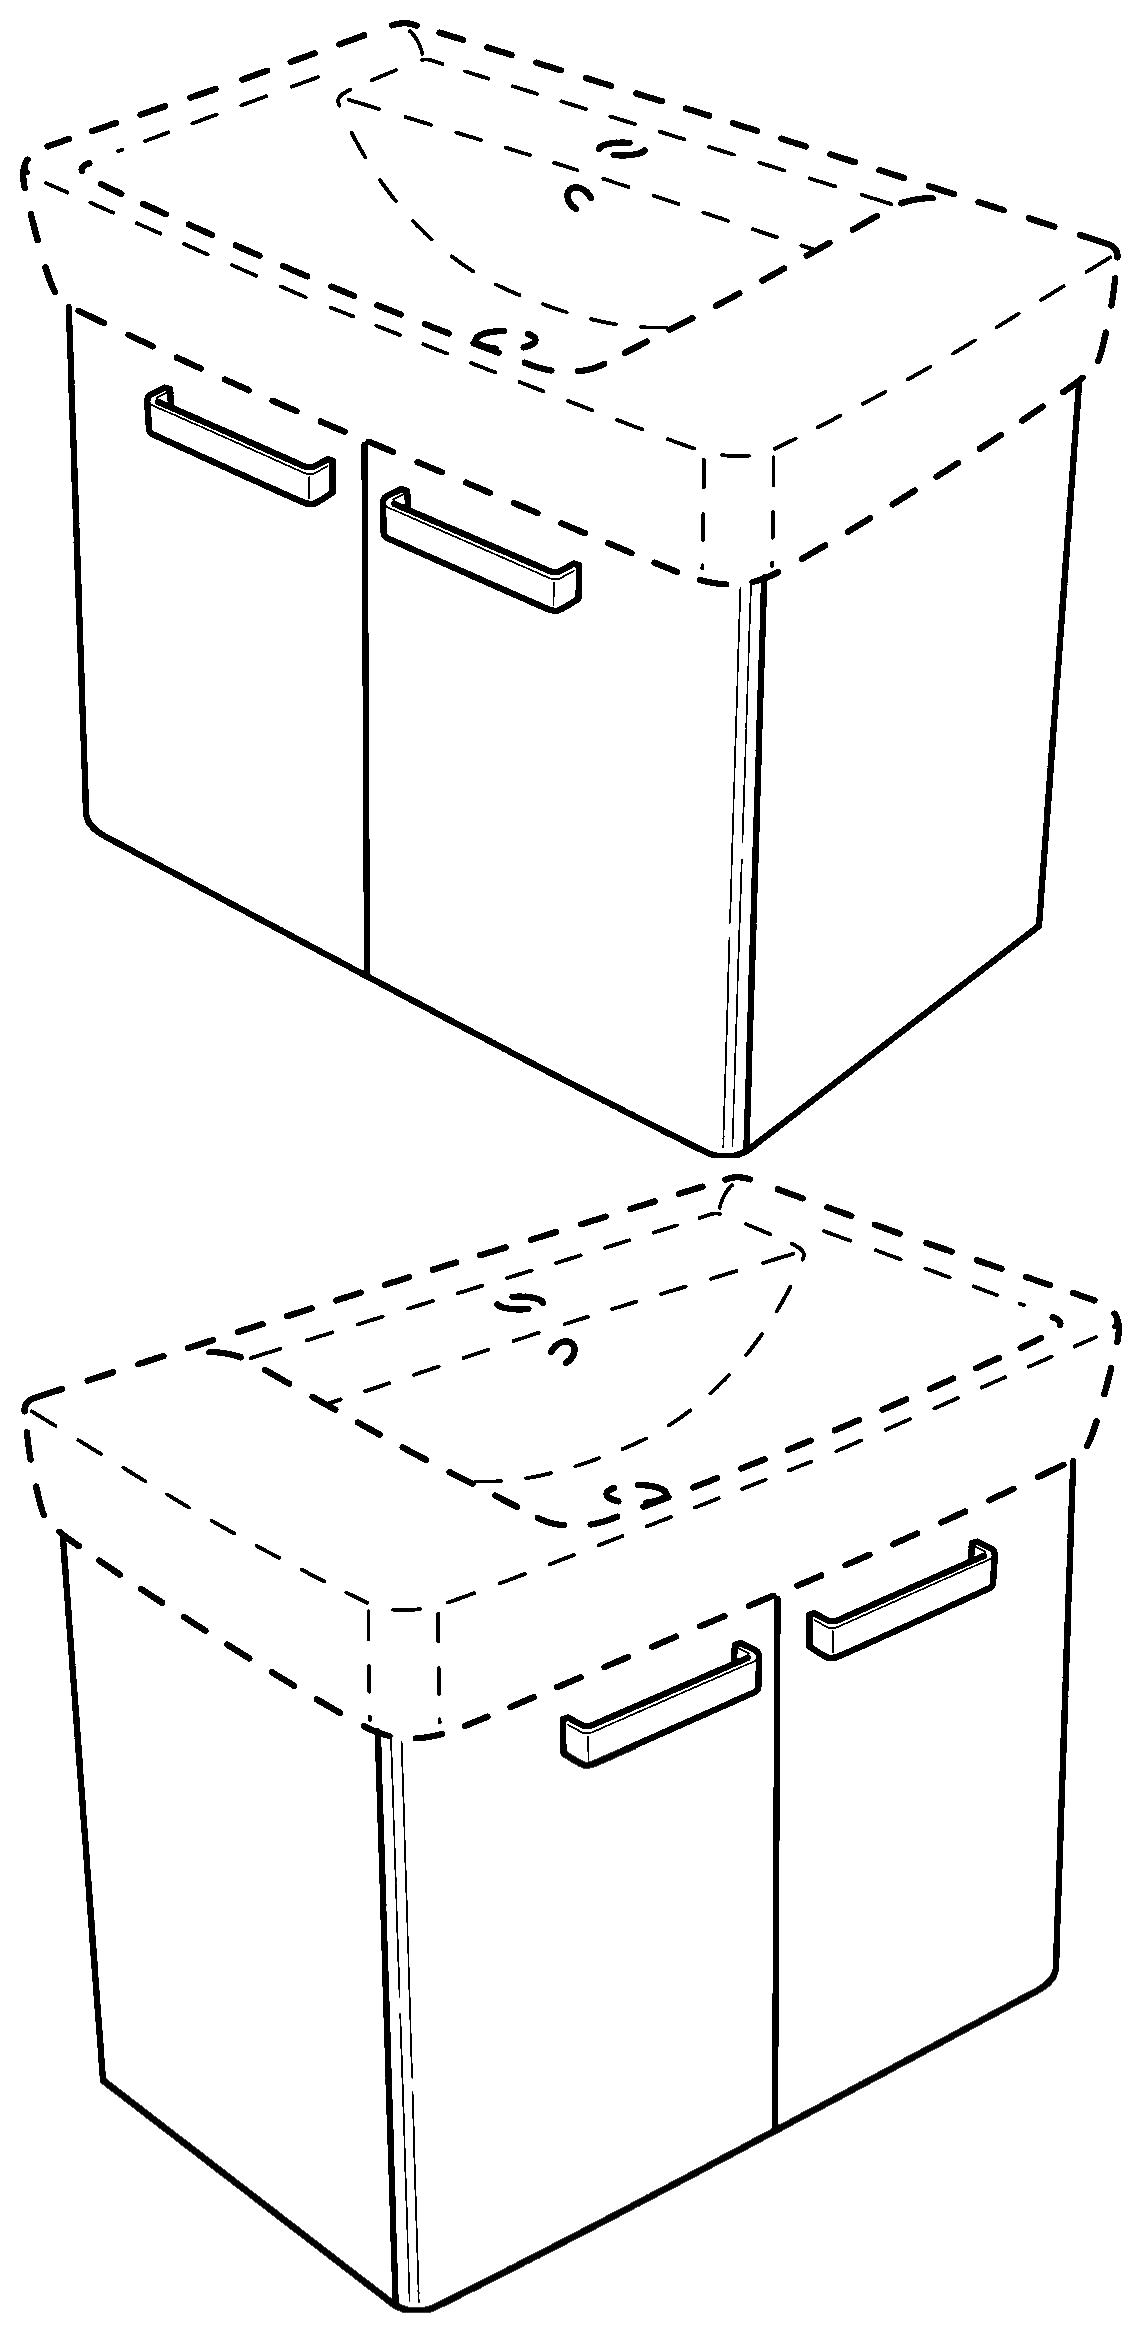 keramag renova nr 1 plan waschtischunterschrank 879140 670x463x445 mm korpus wei front. Black Bedroom Furniture Sets. Home Design Ideas